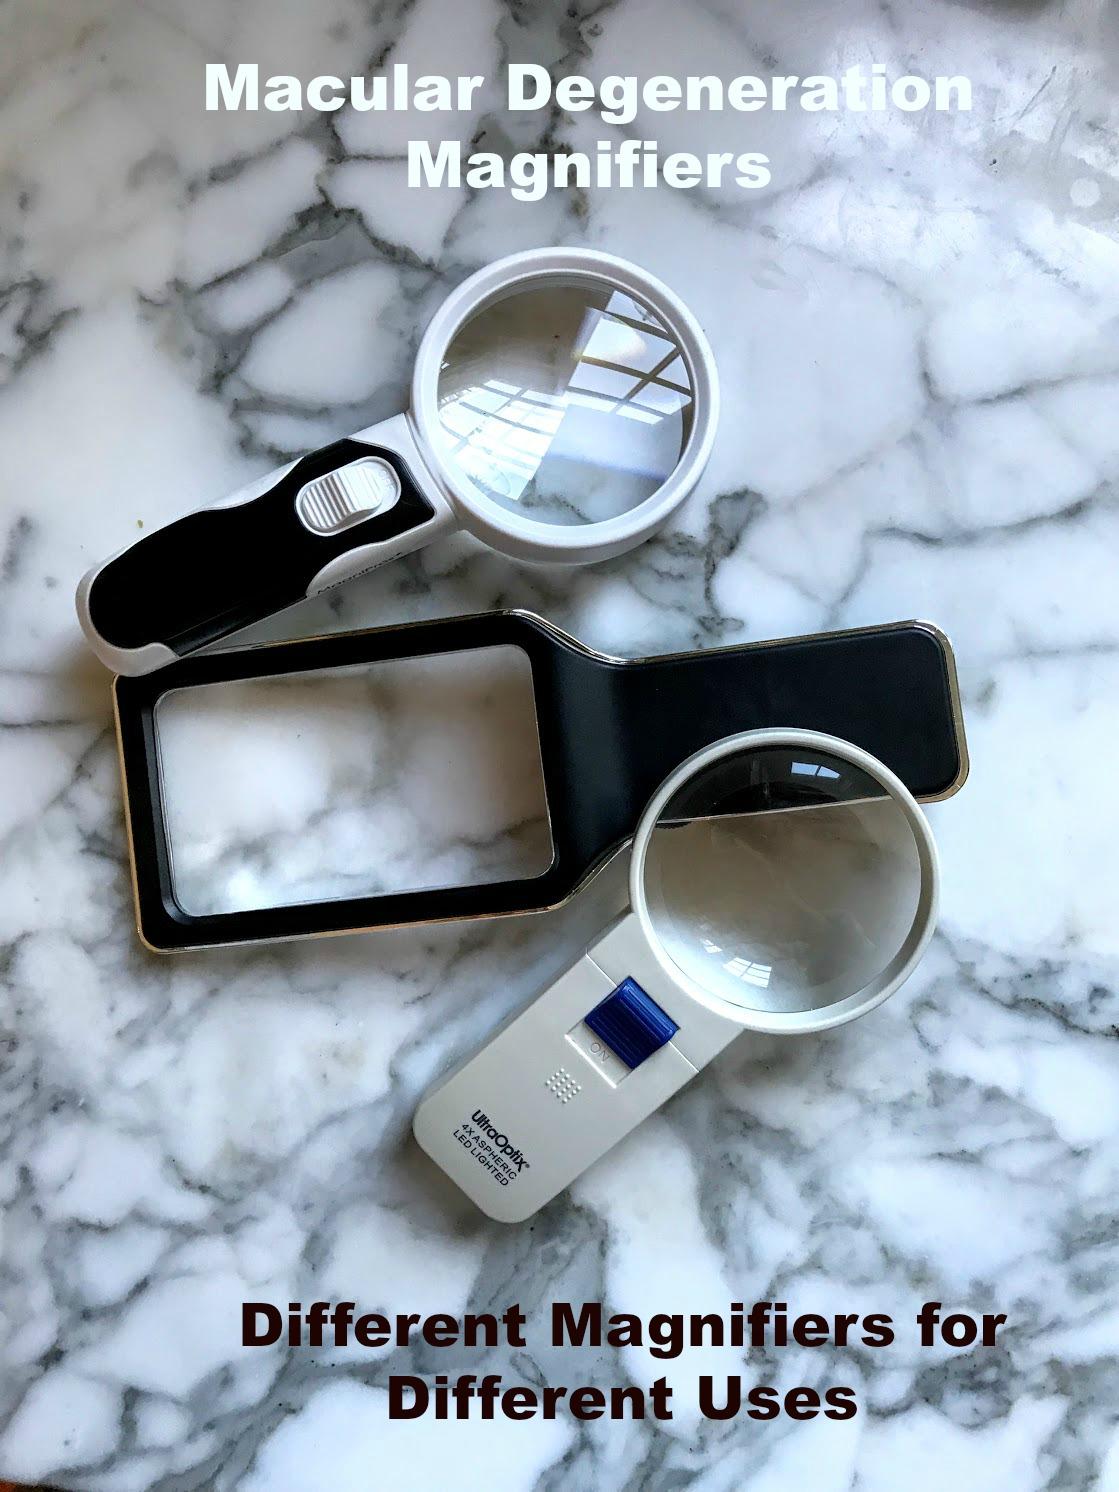 macular degeneration magnifier